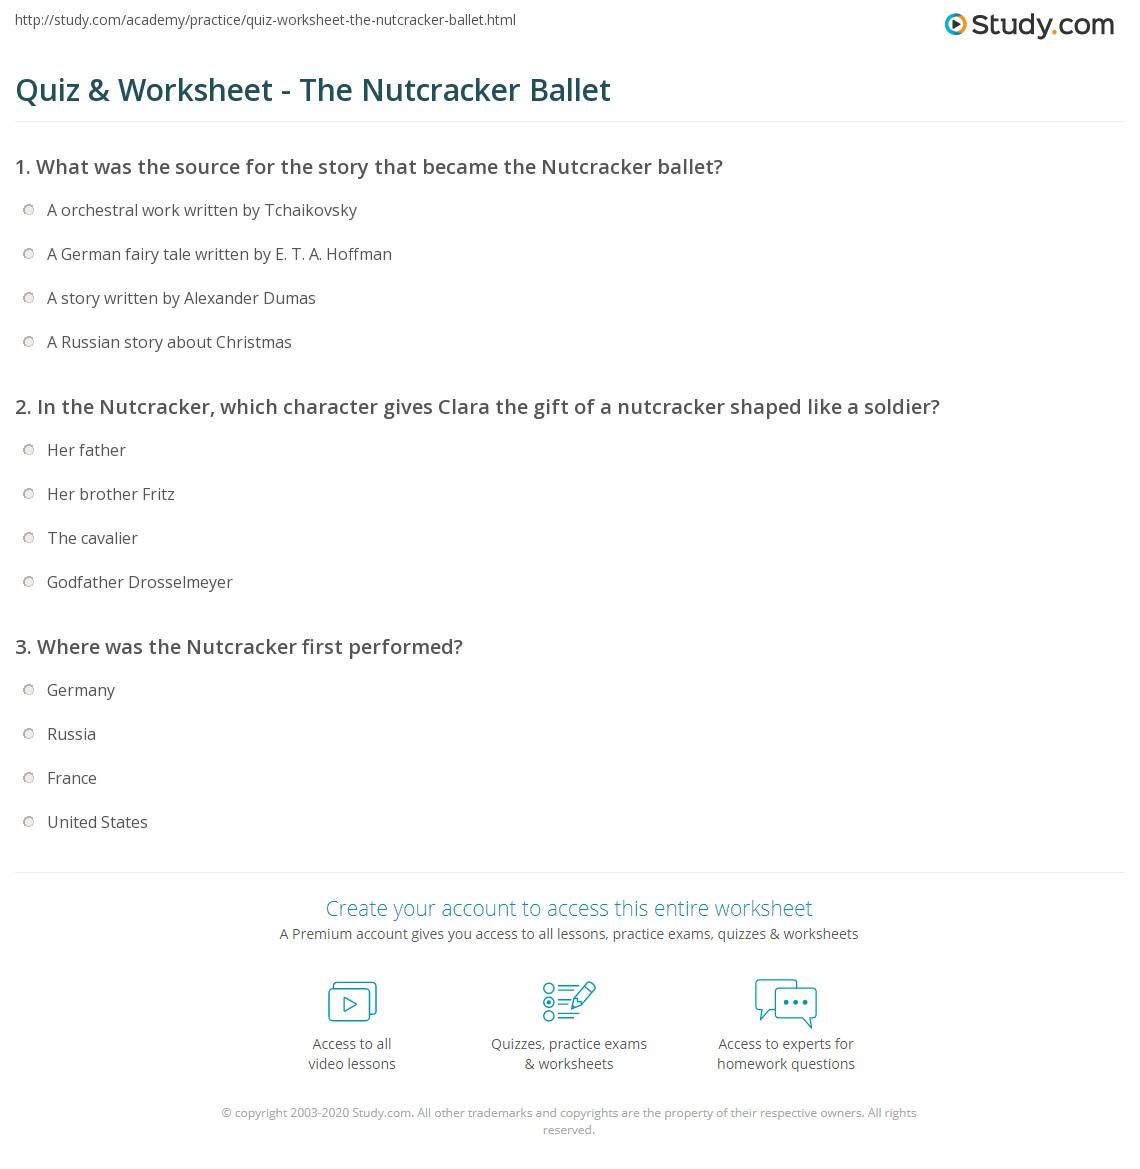 Quiz & Worksheet - The Nutcracker Ballet | Study.com